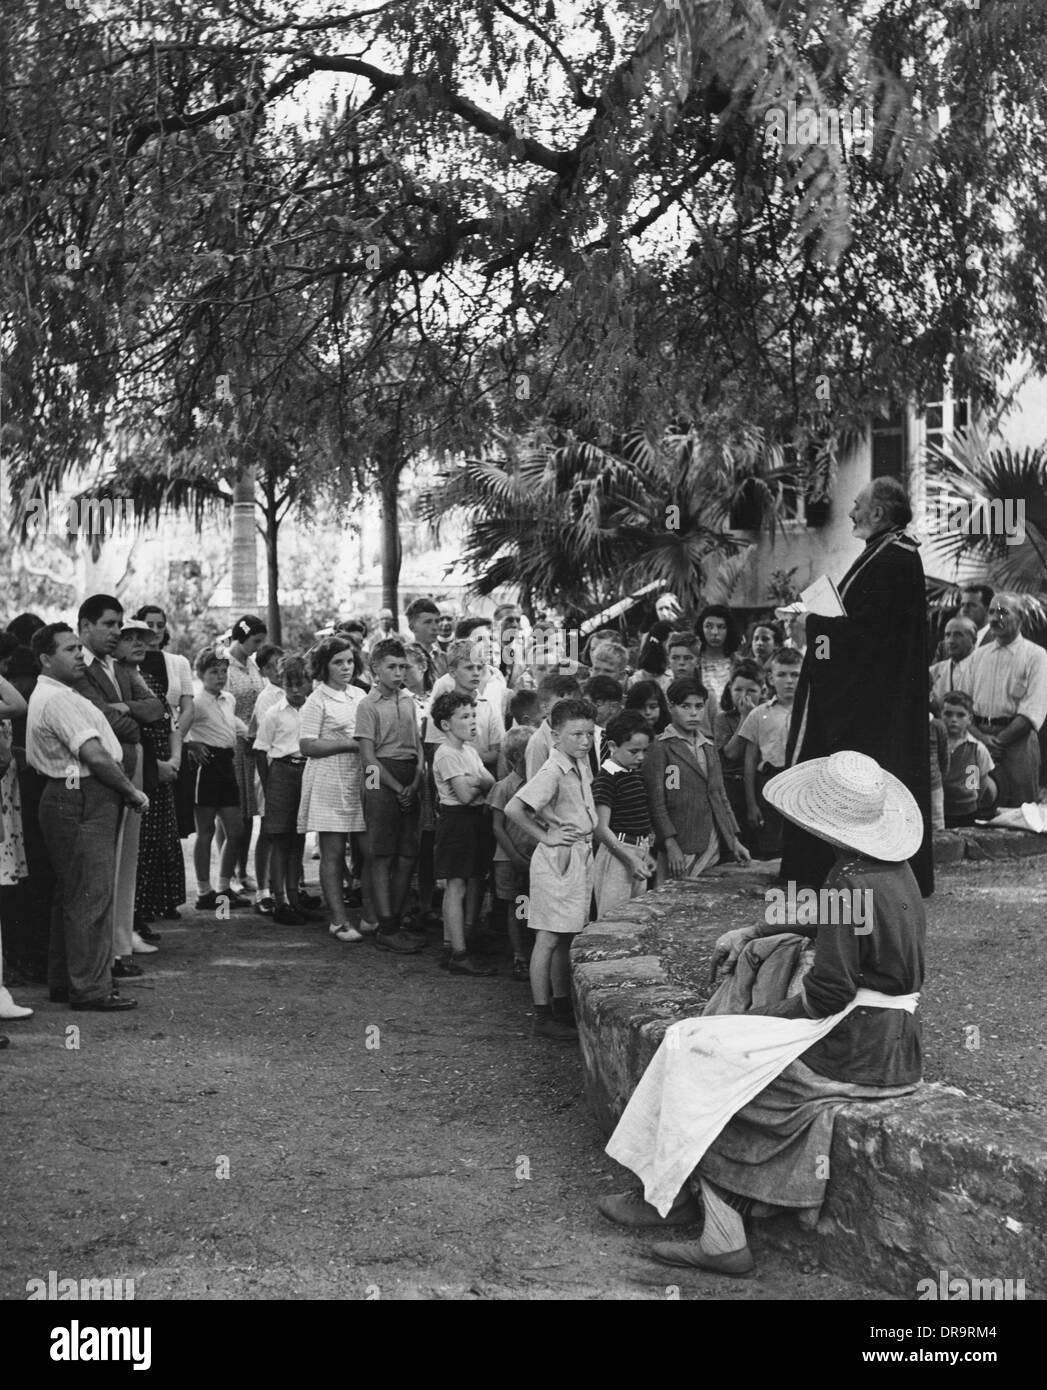 World War II evacuees - Stock Image